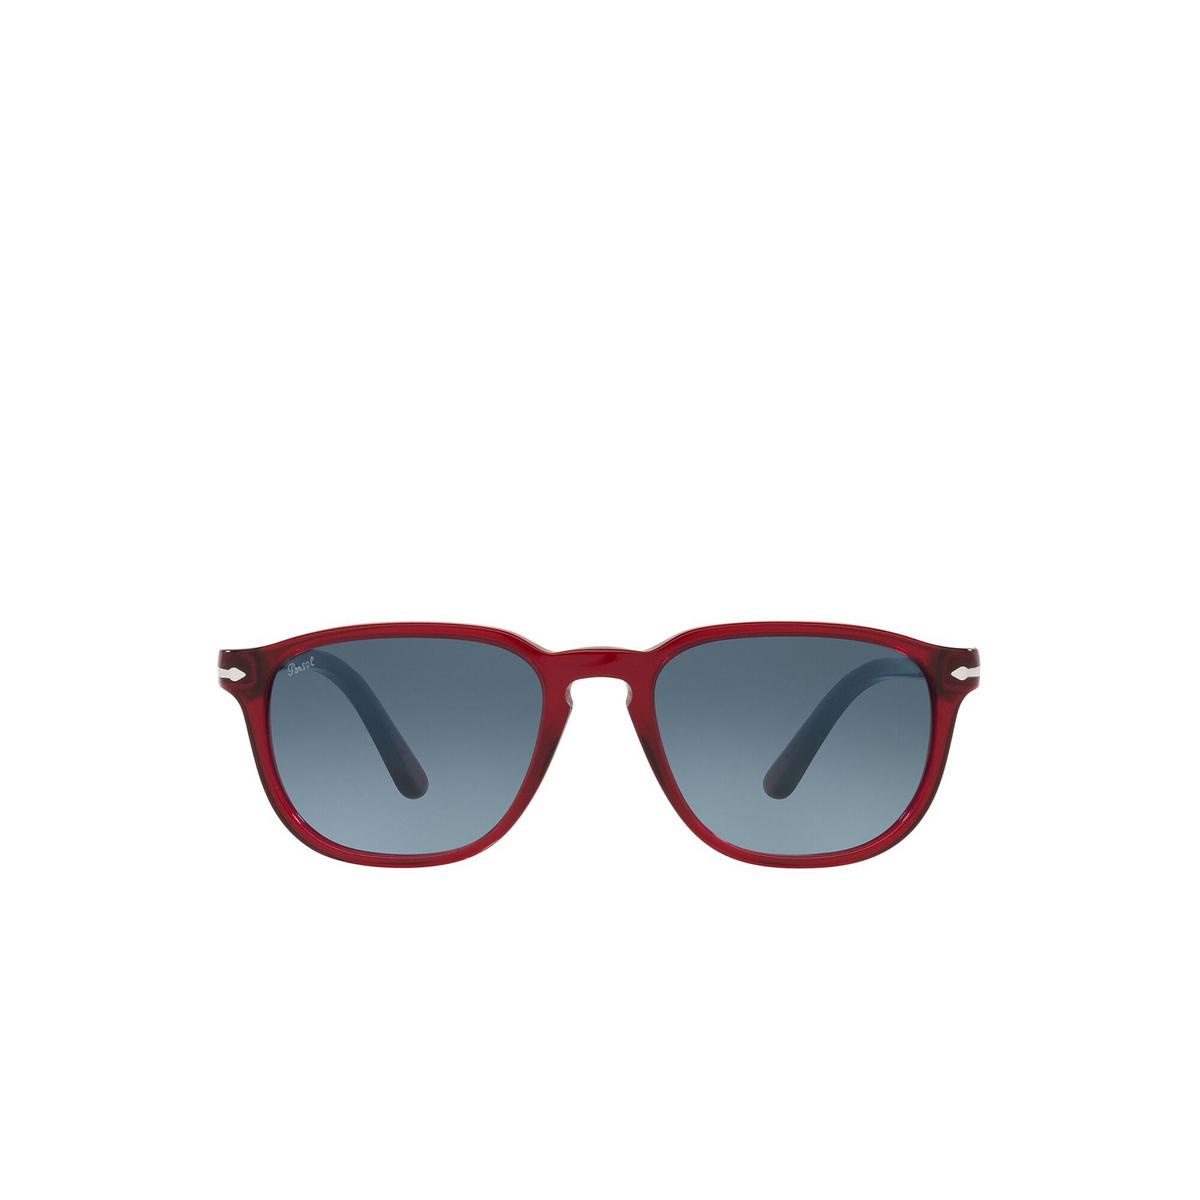 Persol® Square Sunglasses: PO3019S color Transparent Red 126/Q8 - front view.